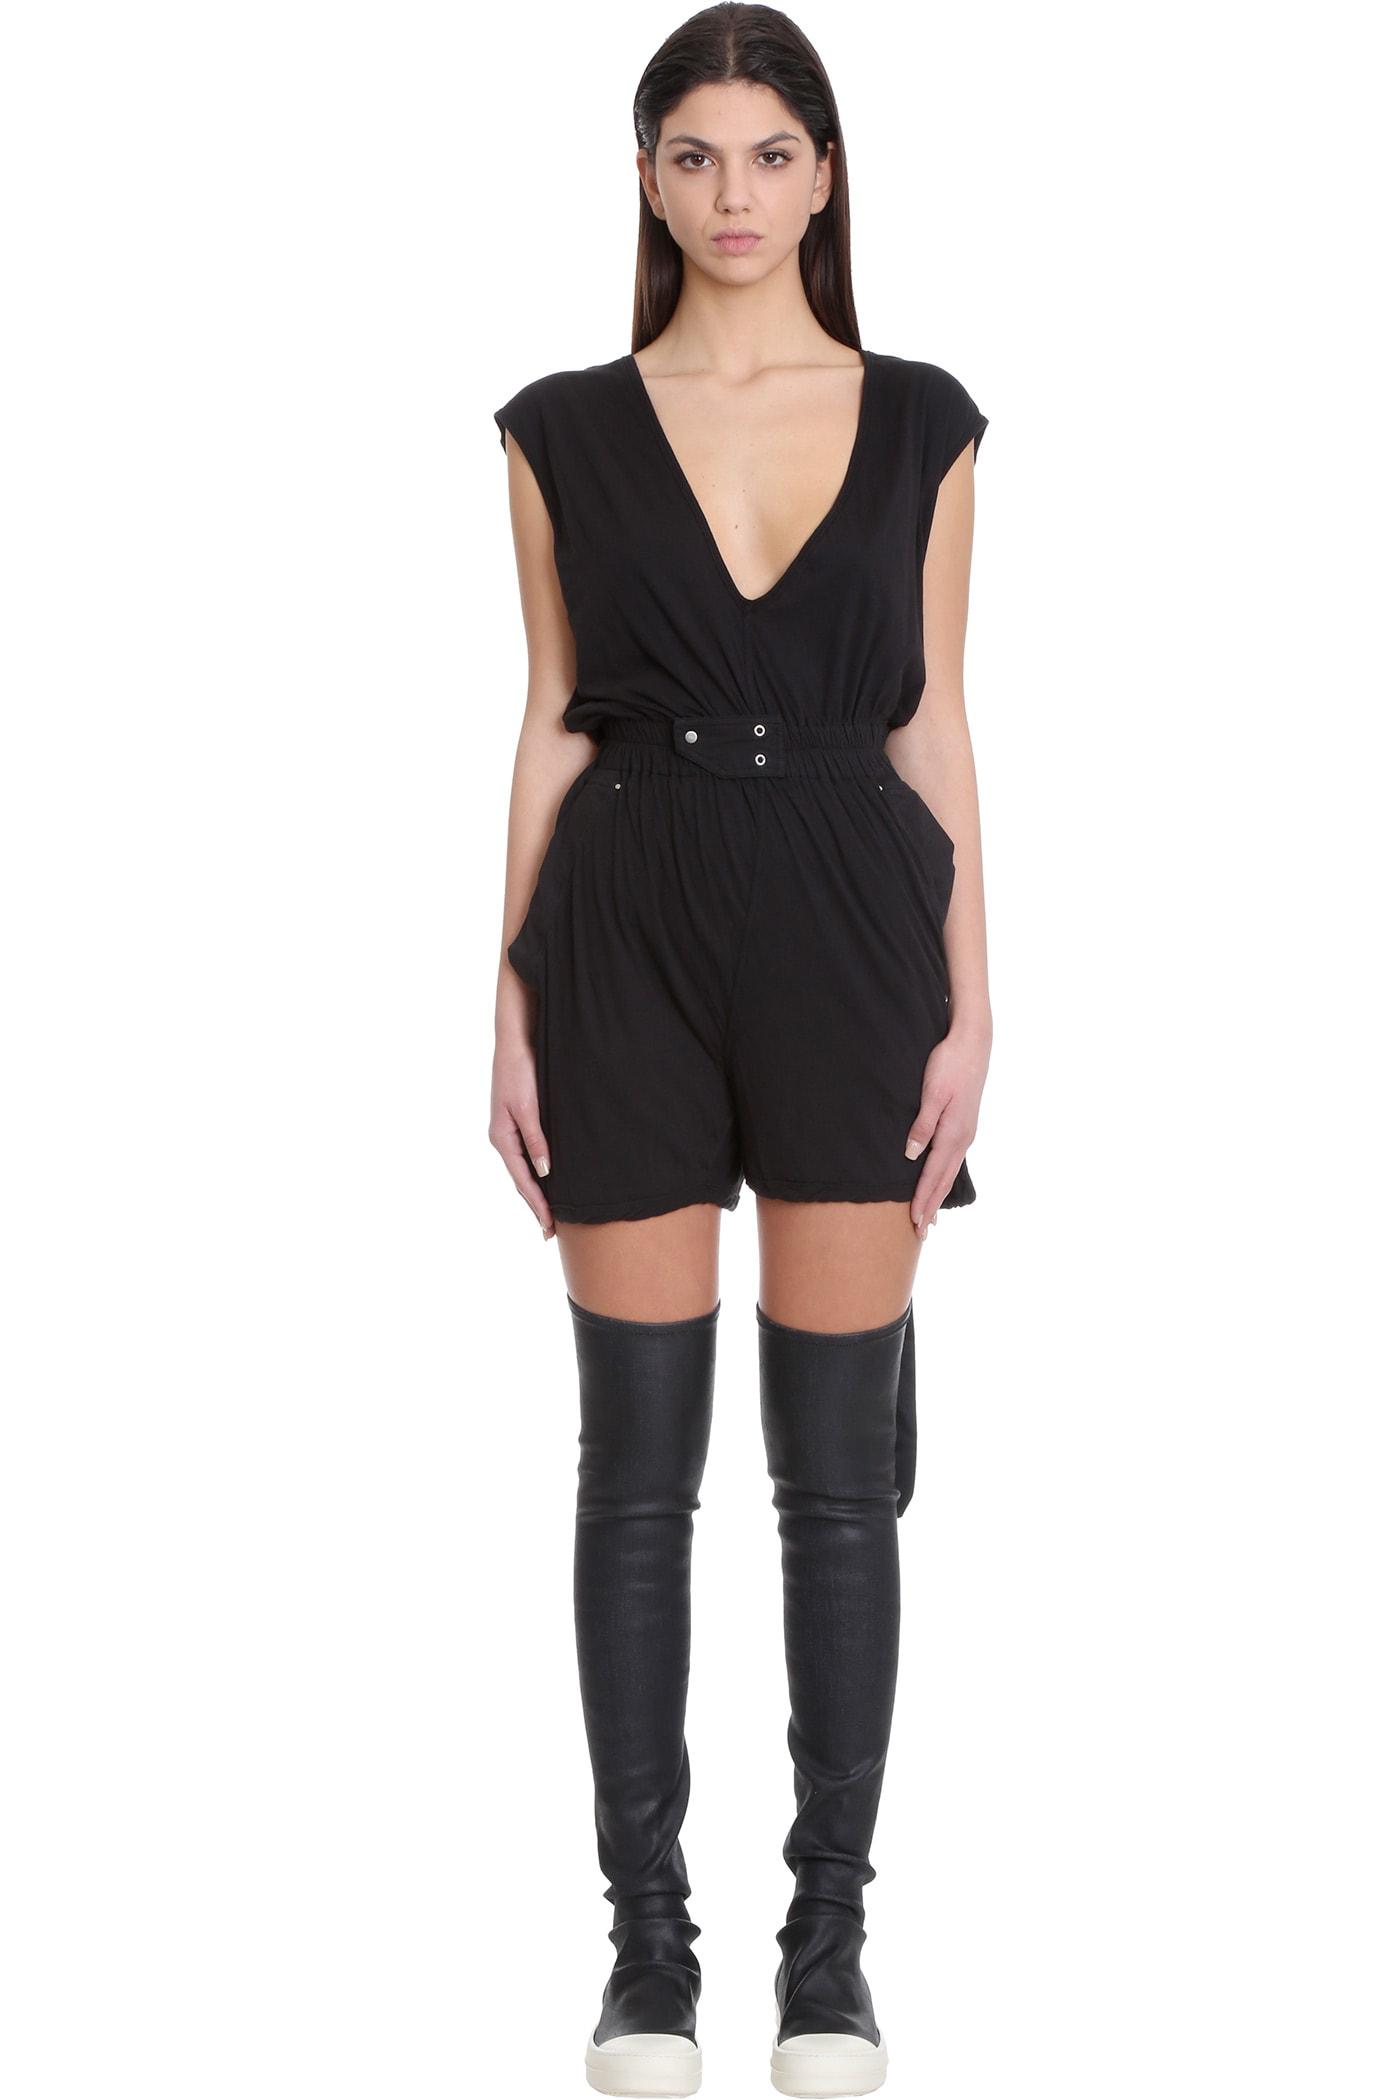 Bodybag Suit In Black Cotton